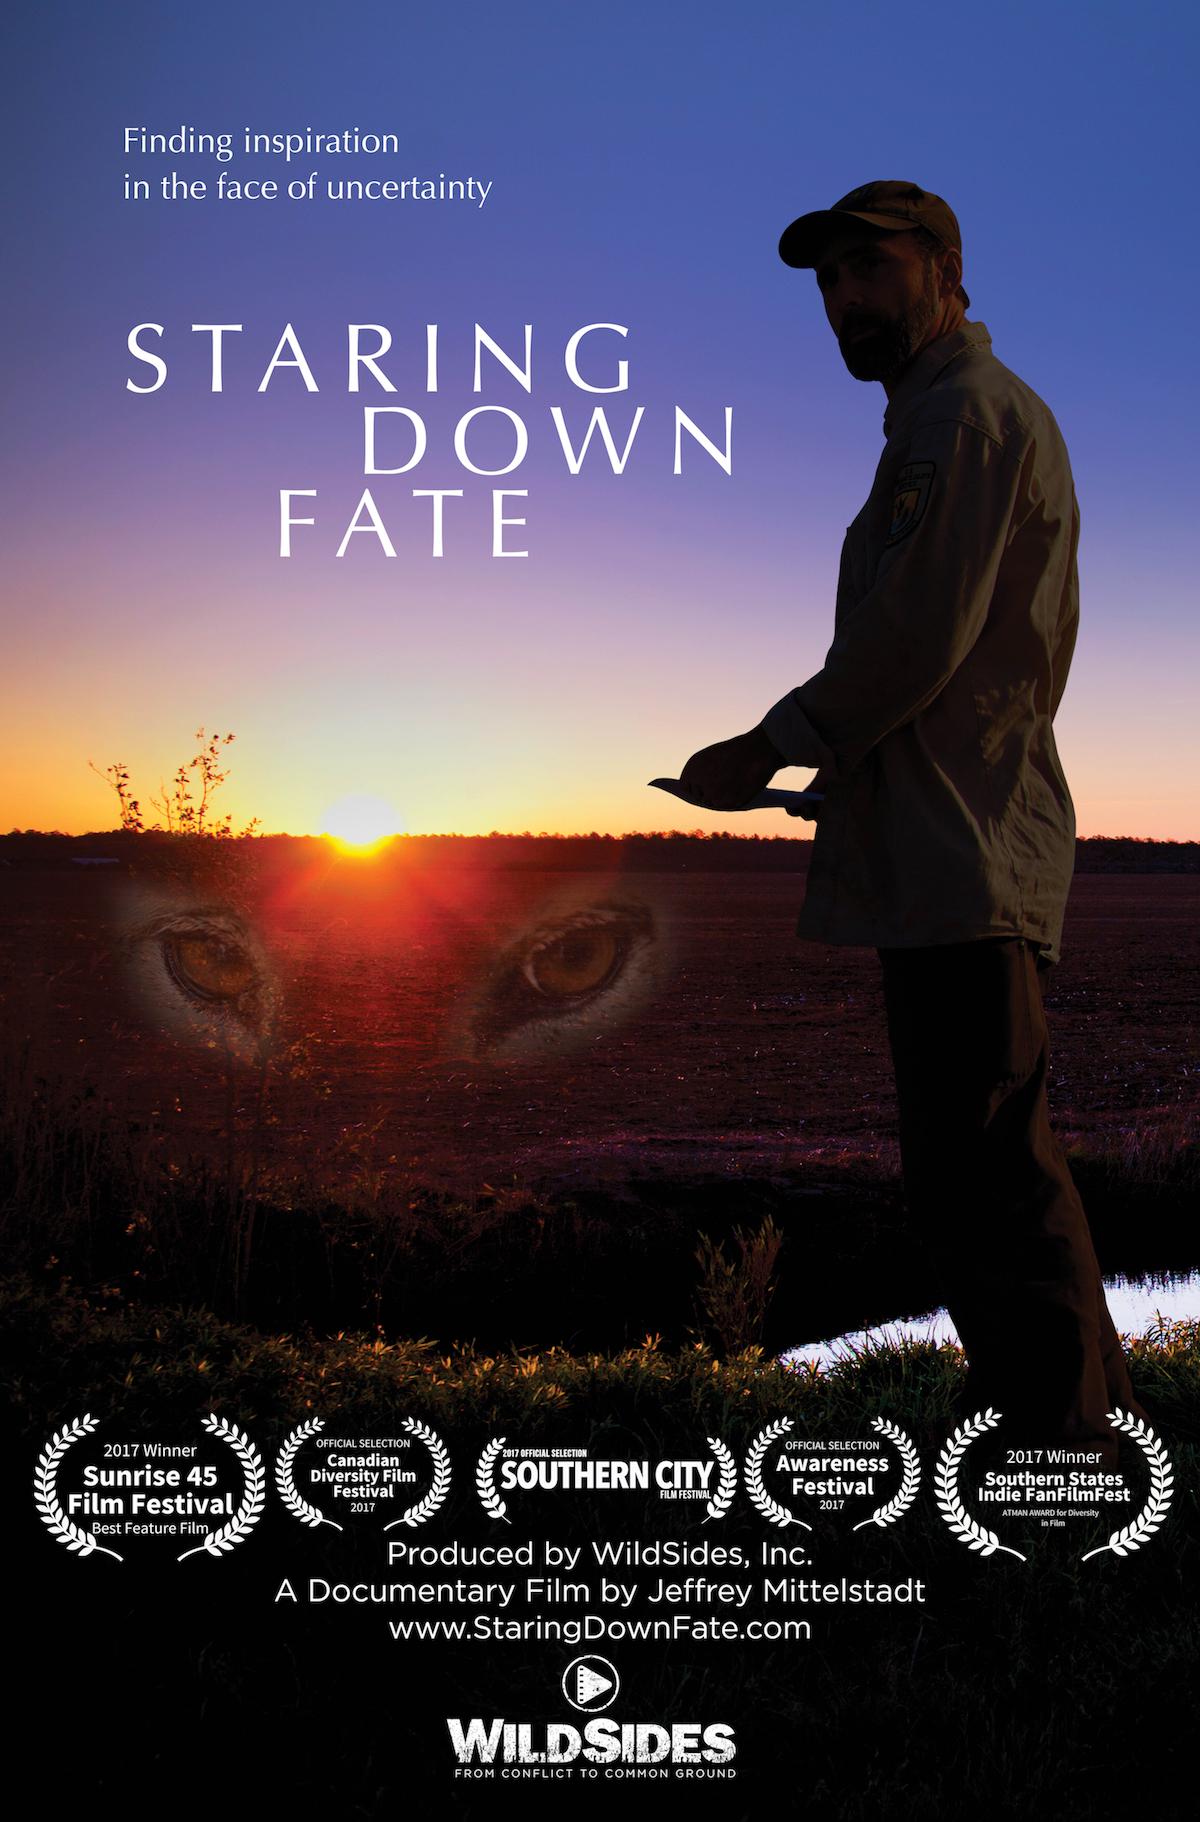 Staring down fate poster 2-02 Larger Laurels_4x6 copy.jpg